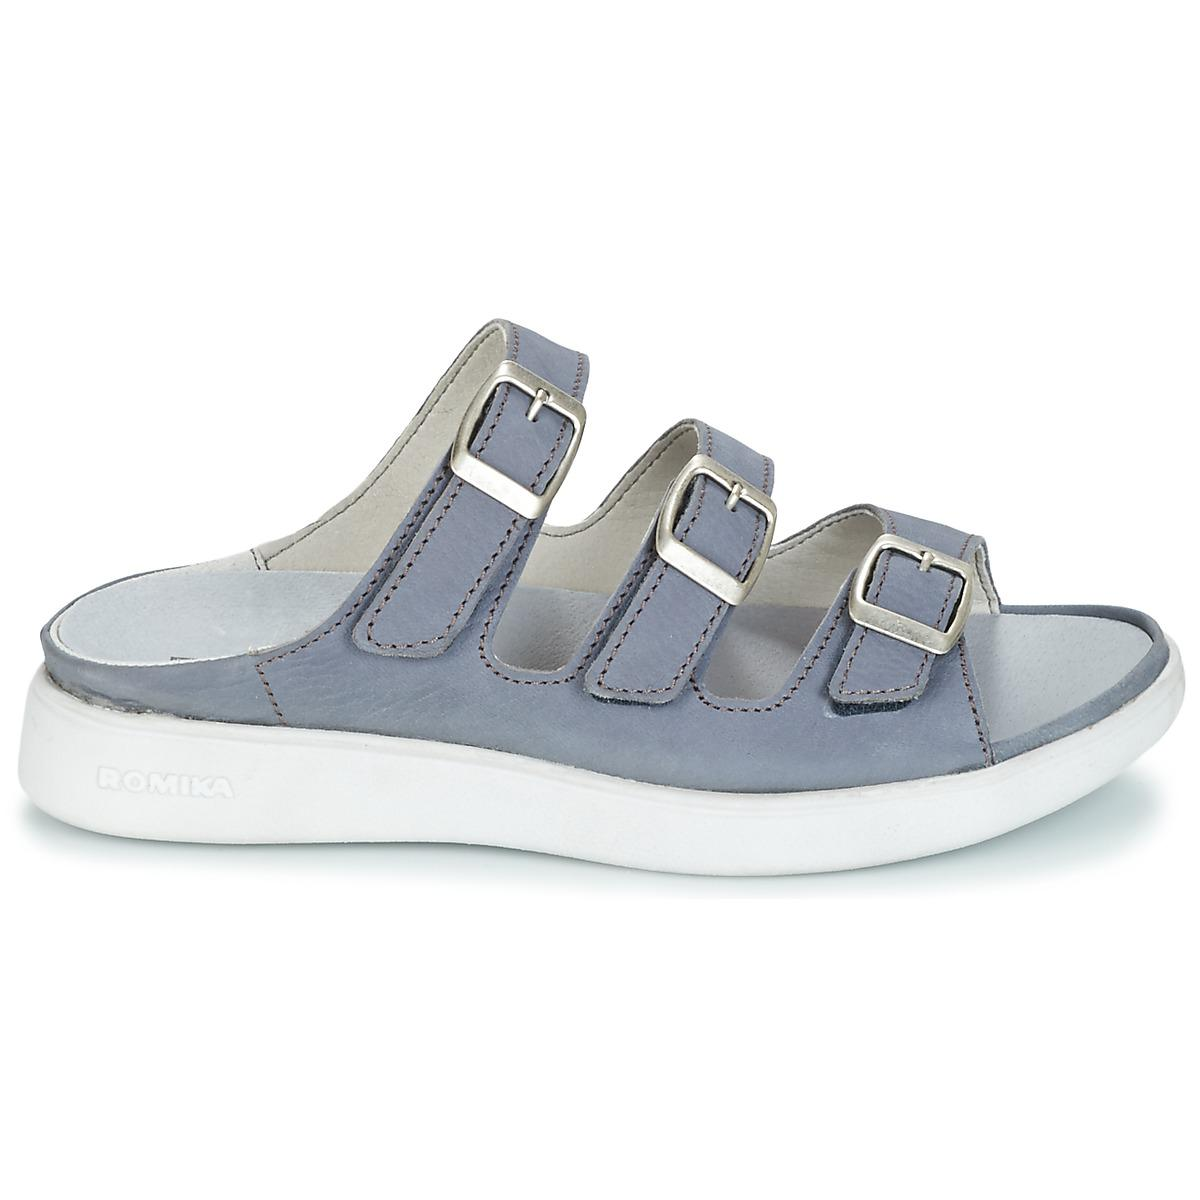 Romika Pour Mules Gomera Sandale Casual Bleu 02 En Chaussures Femmes qwRUH